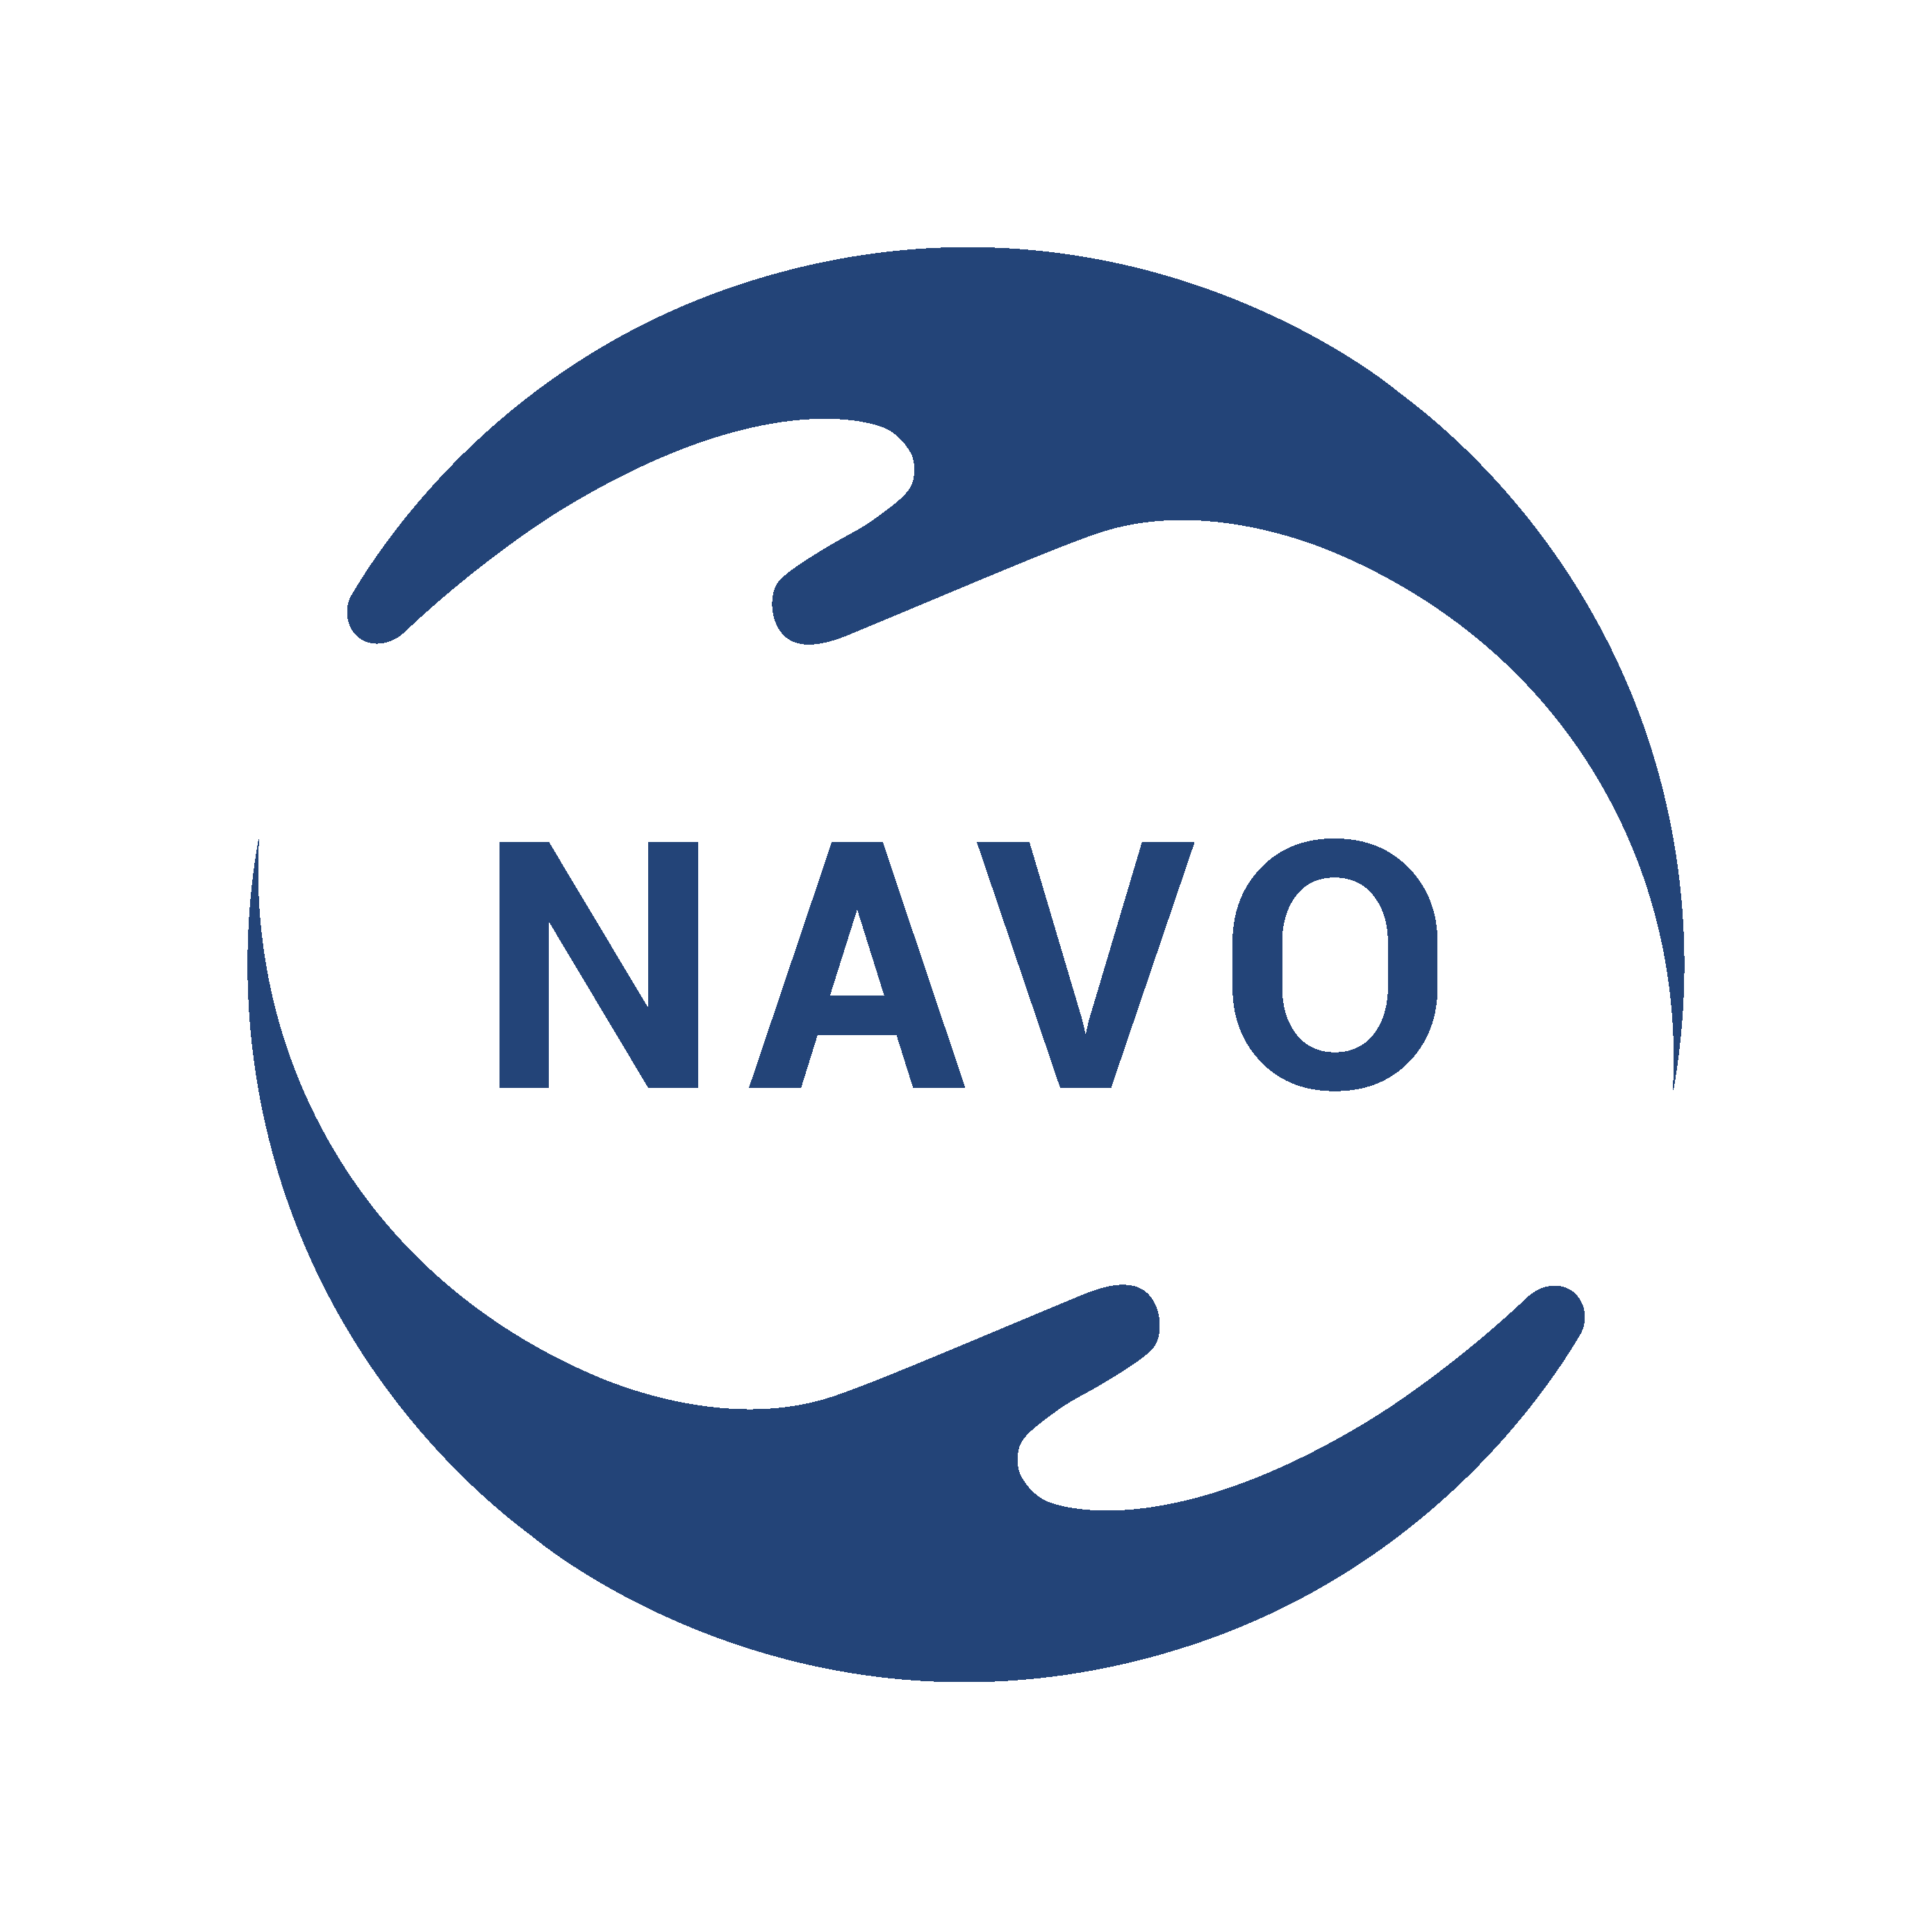 200331_Logo_NAVO_ohne claim_rgb_#tranparent_RZ